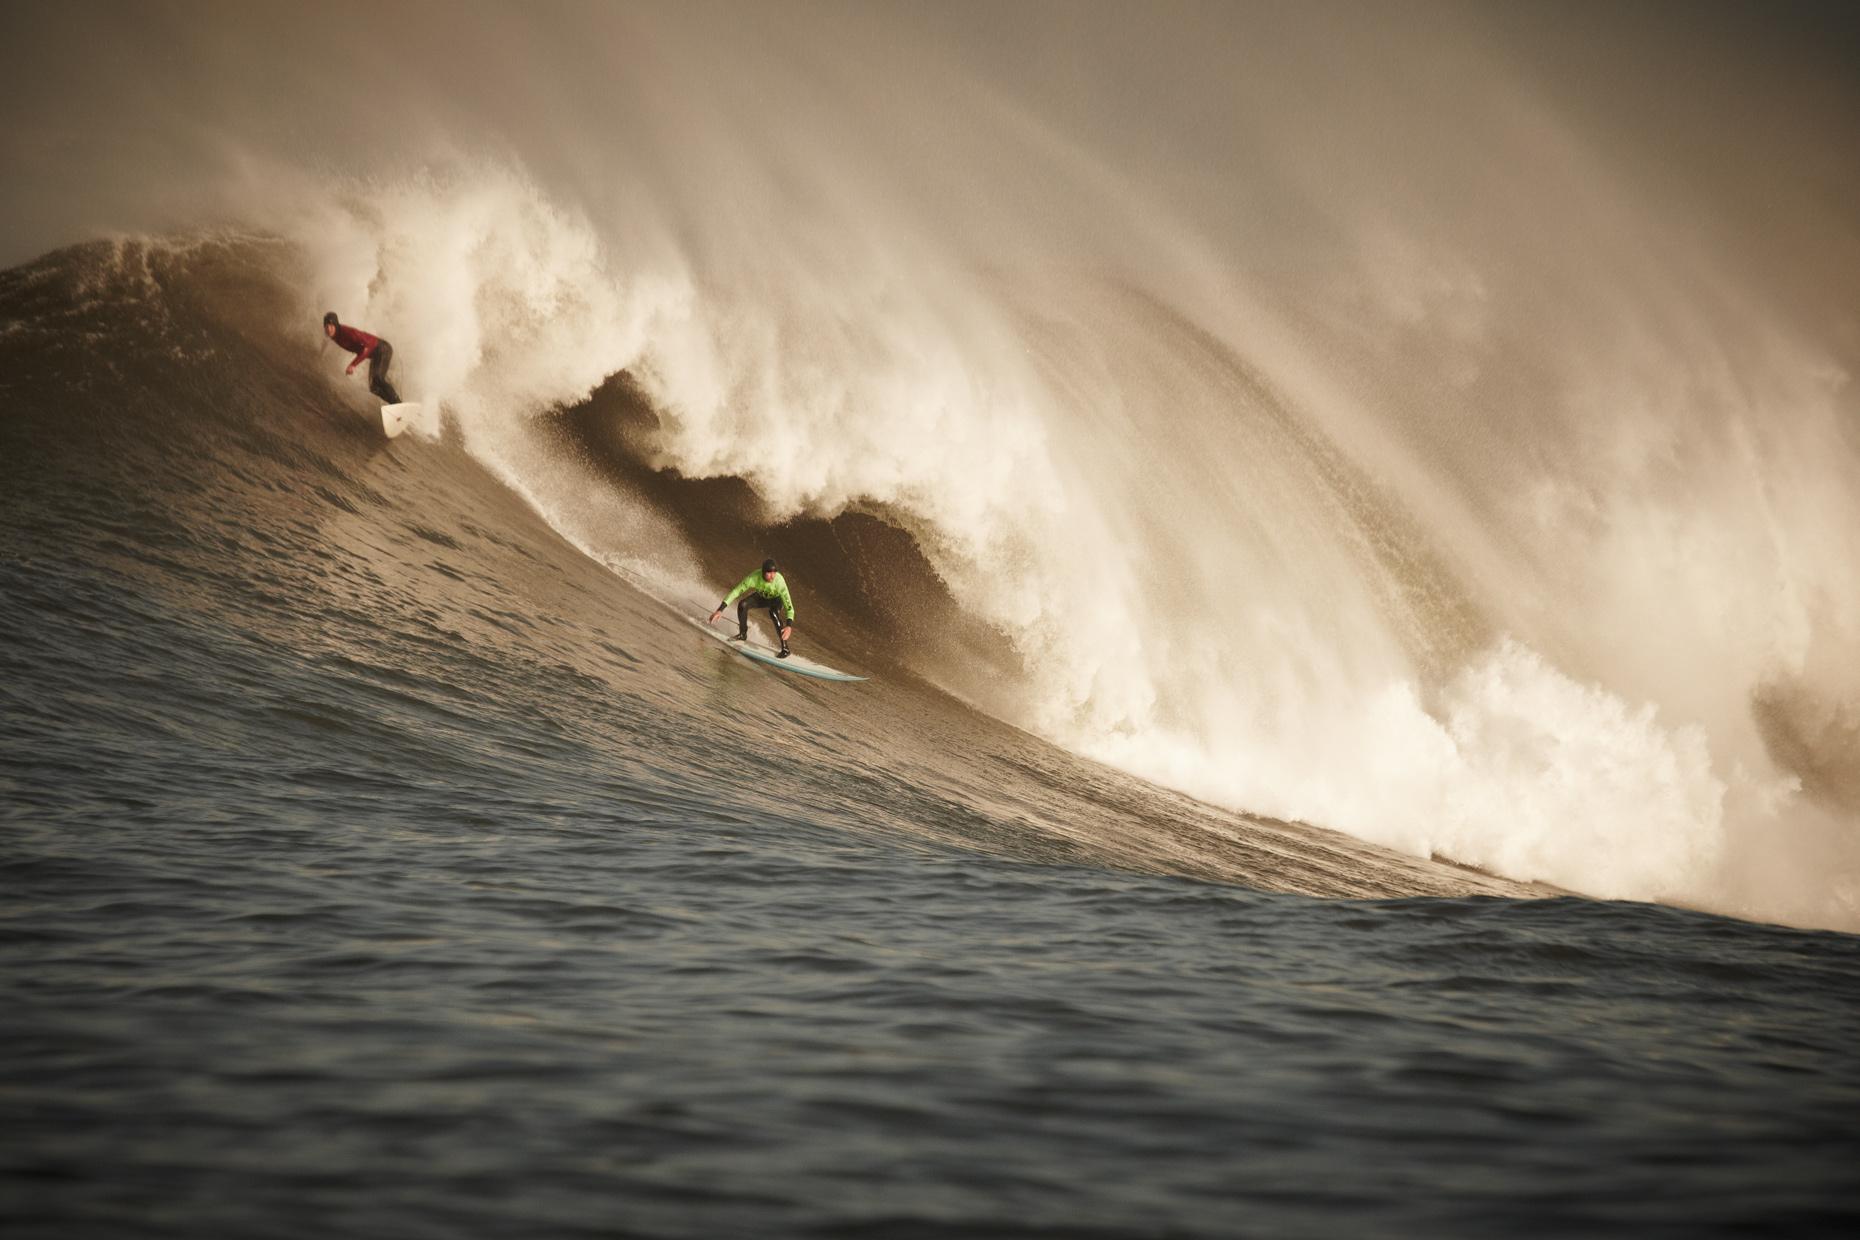 Projects Action Photography Derek Israelsen 001 Surfers Huge Wave